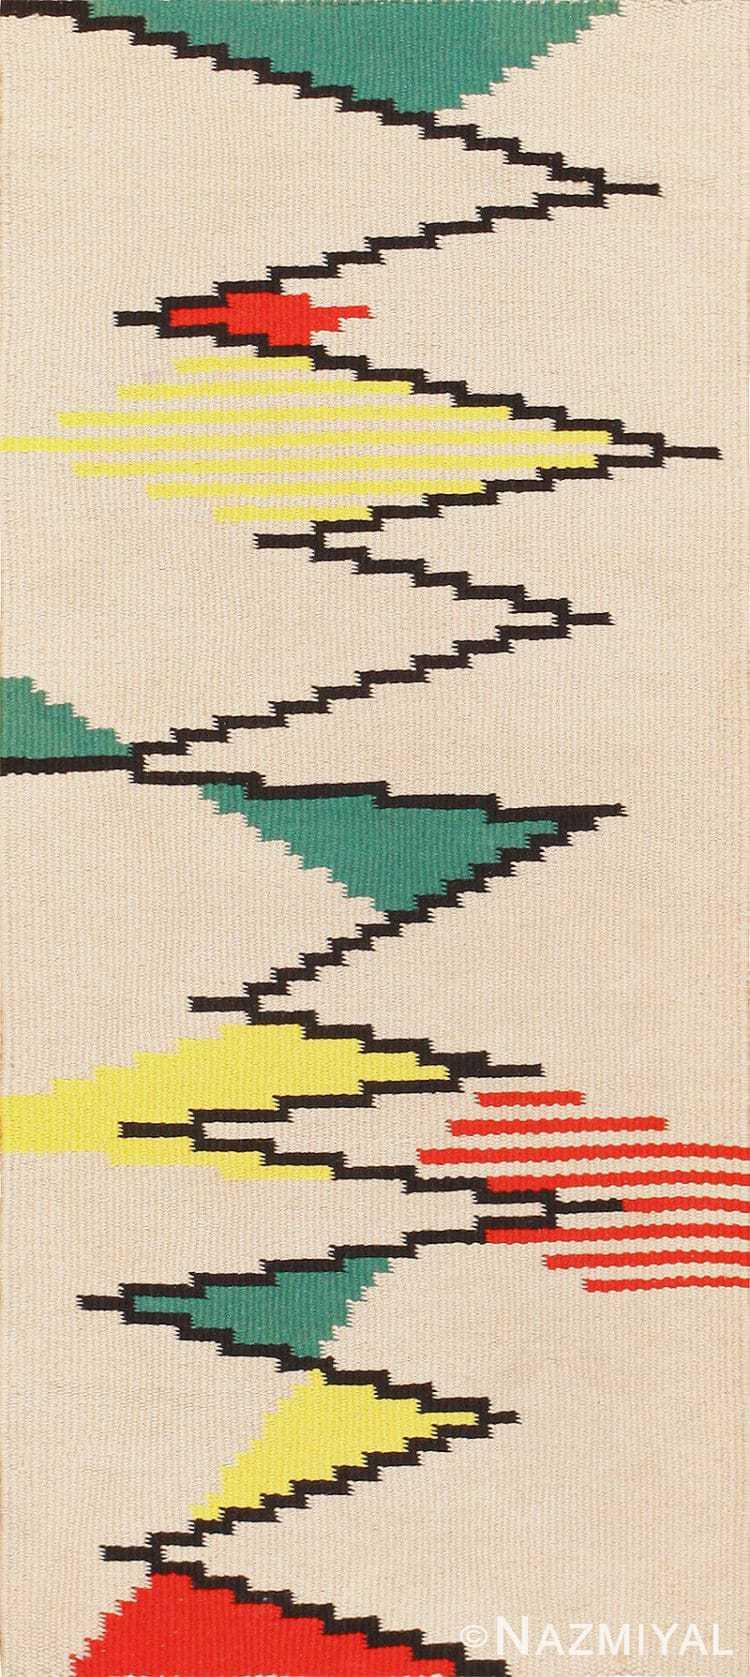 Small Vintage Swedish Scandinavian Kilim Rug by Artist Antonin Kybal 48895 Nazmiyal